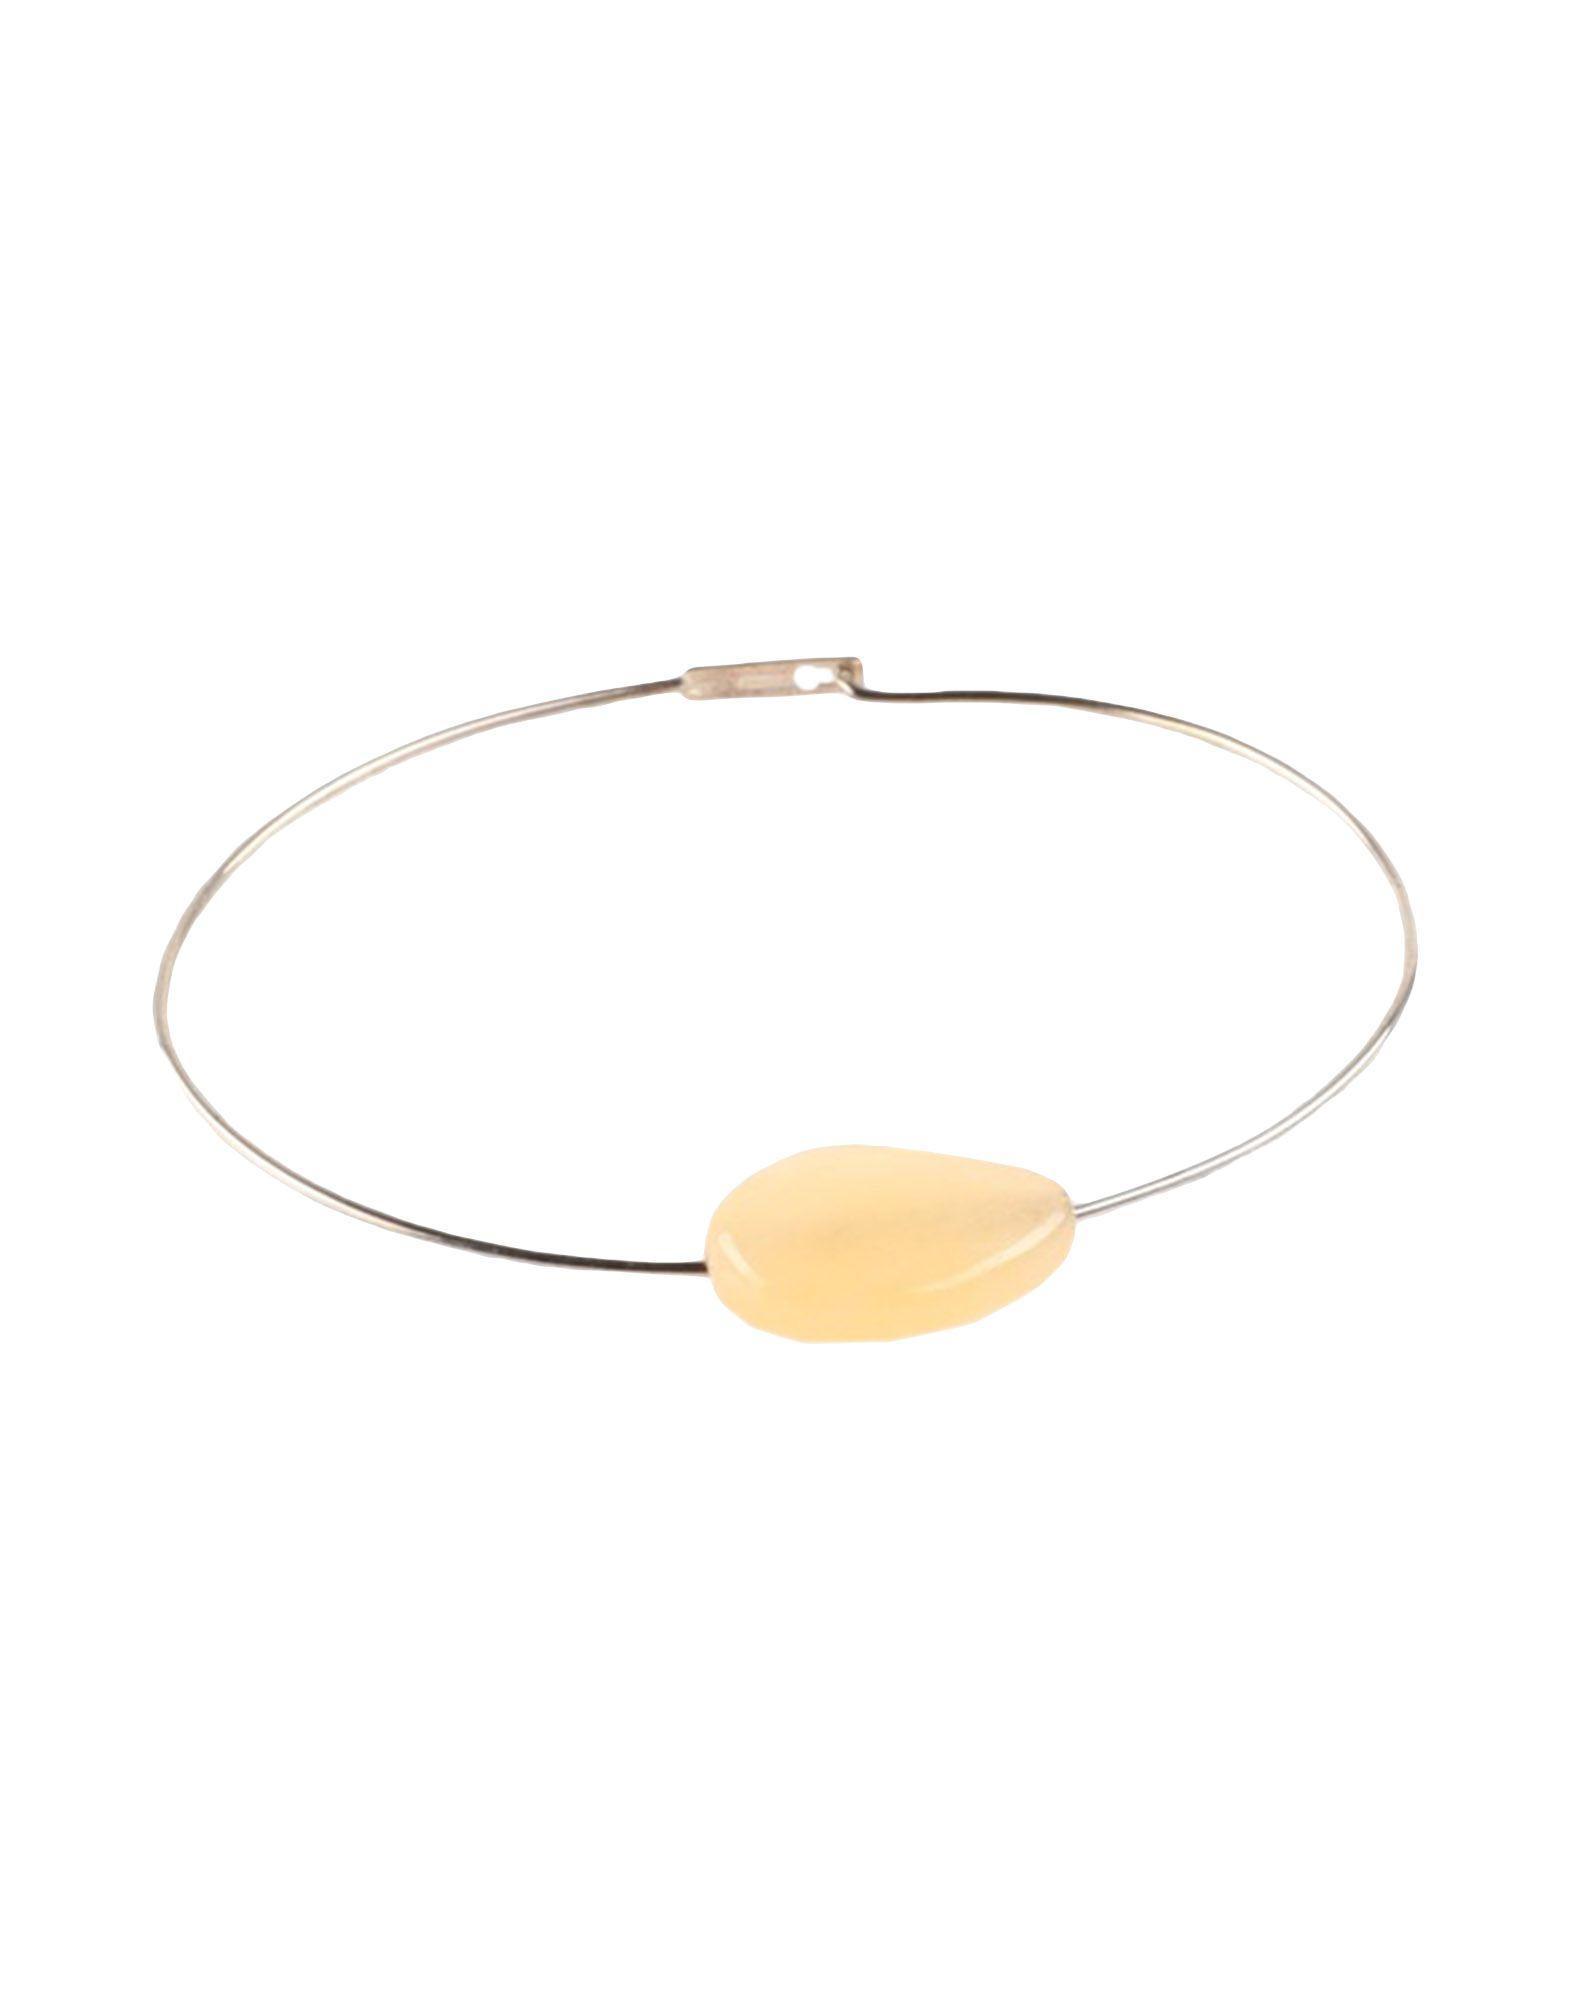 JIL SANDER Bracelets. contrasting applications, hook fastening. Metal, Stone